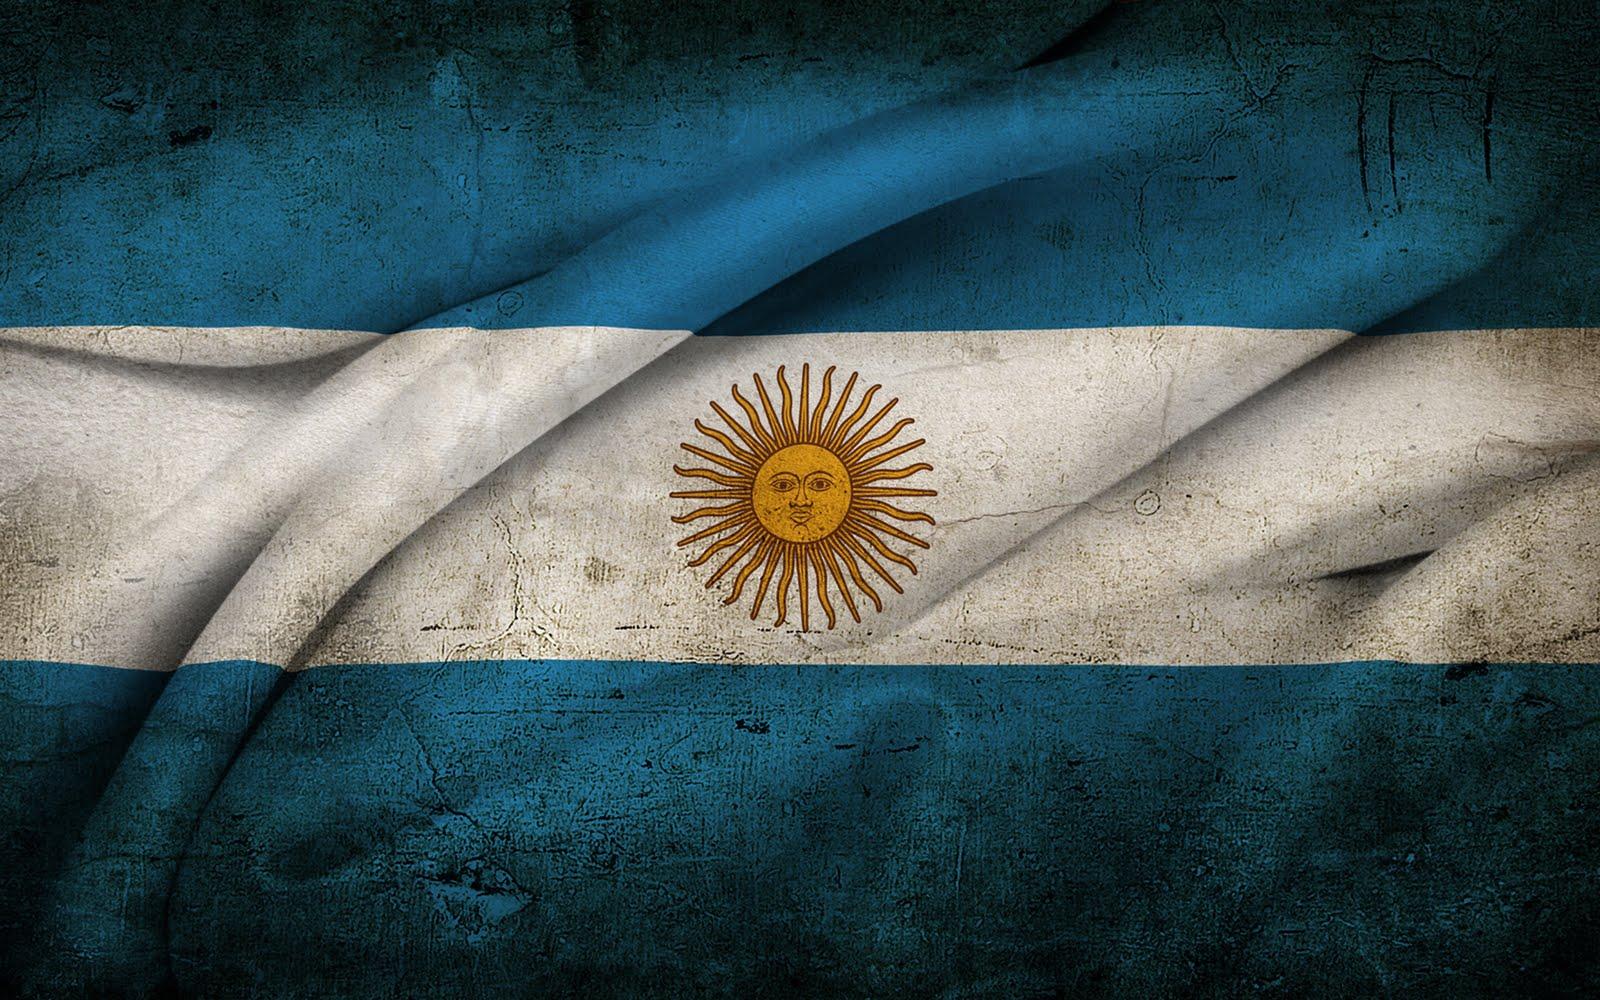 http://1.bp.blogspot.com/_q9VoBXYE-nc/S8cfw5vM4II/AAAAAAAAAbA/kmdHfJYXuVo/s1600/Wallpapers-room_com___Argentina_Grunge_Flag_by_xxoblivionxx_1680x1050.jpg